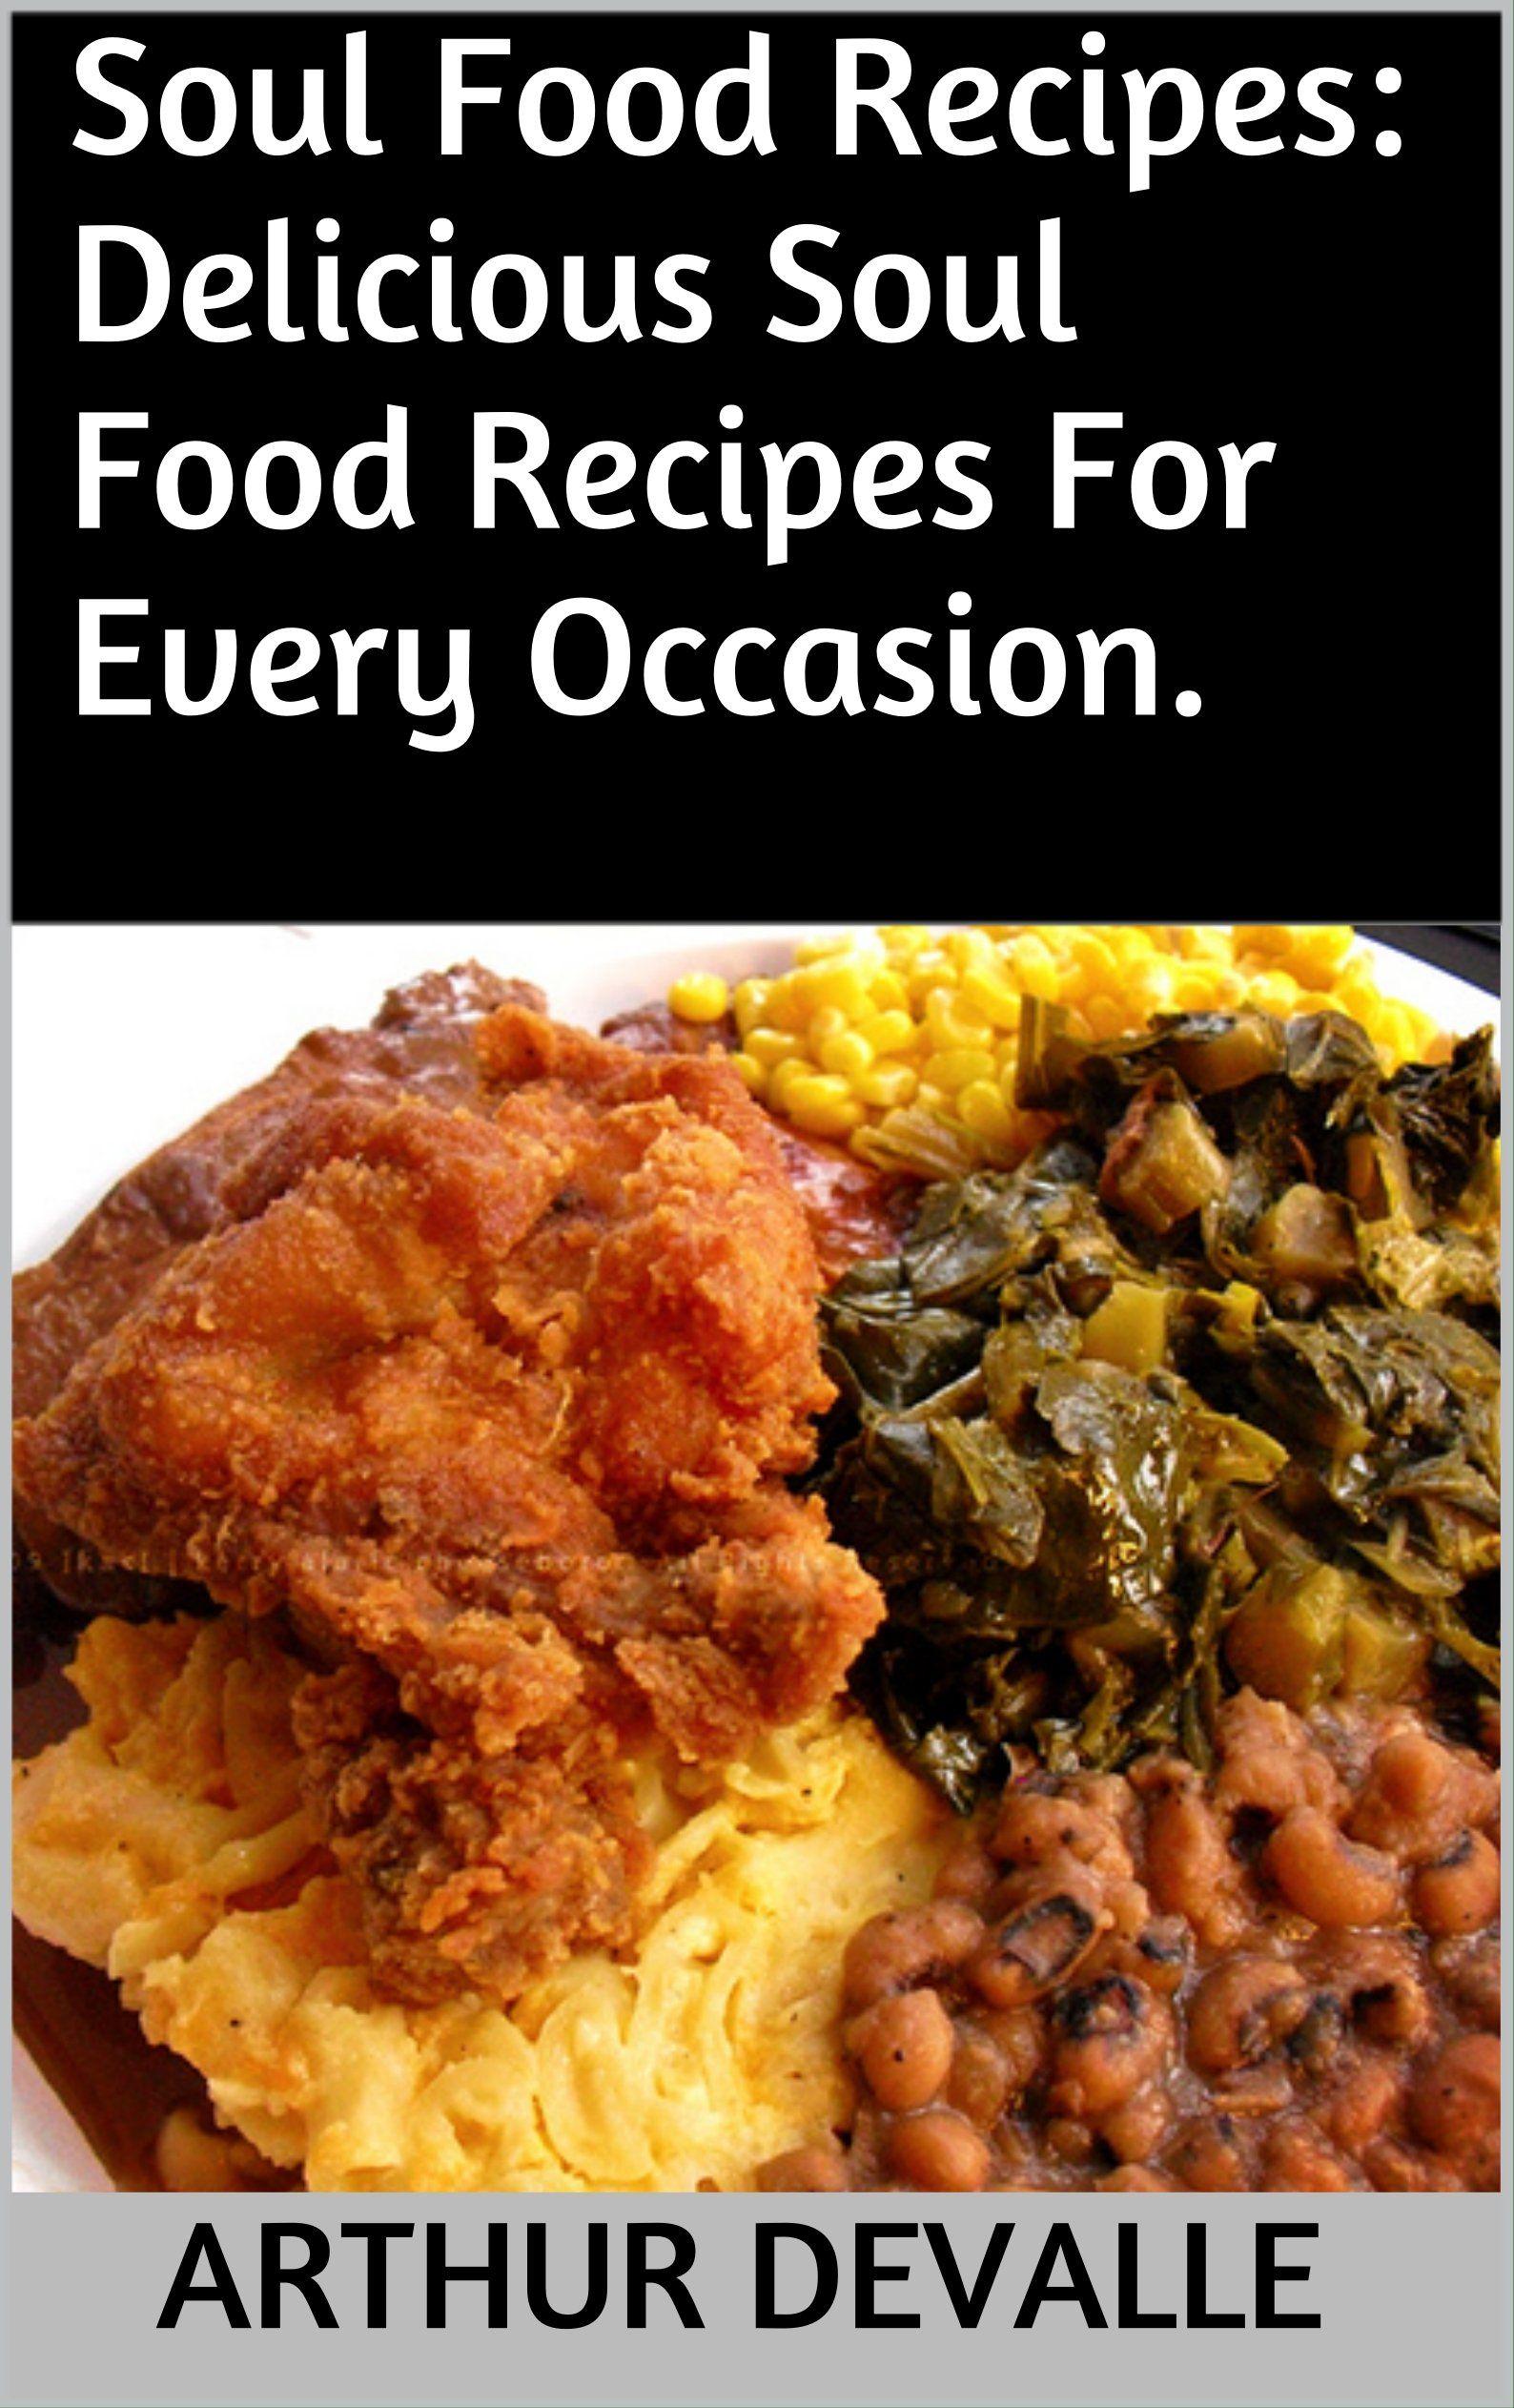 Soul food - Wikipedia